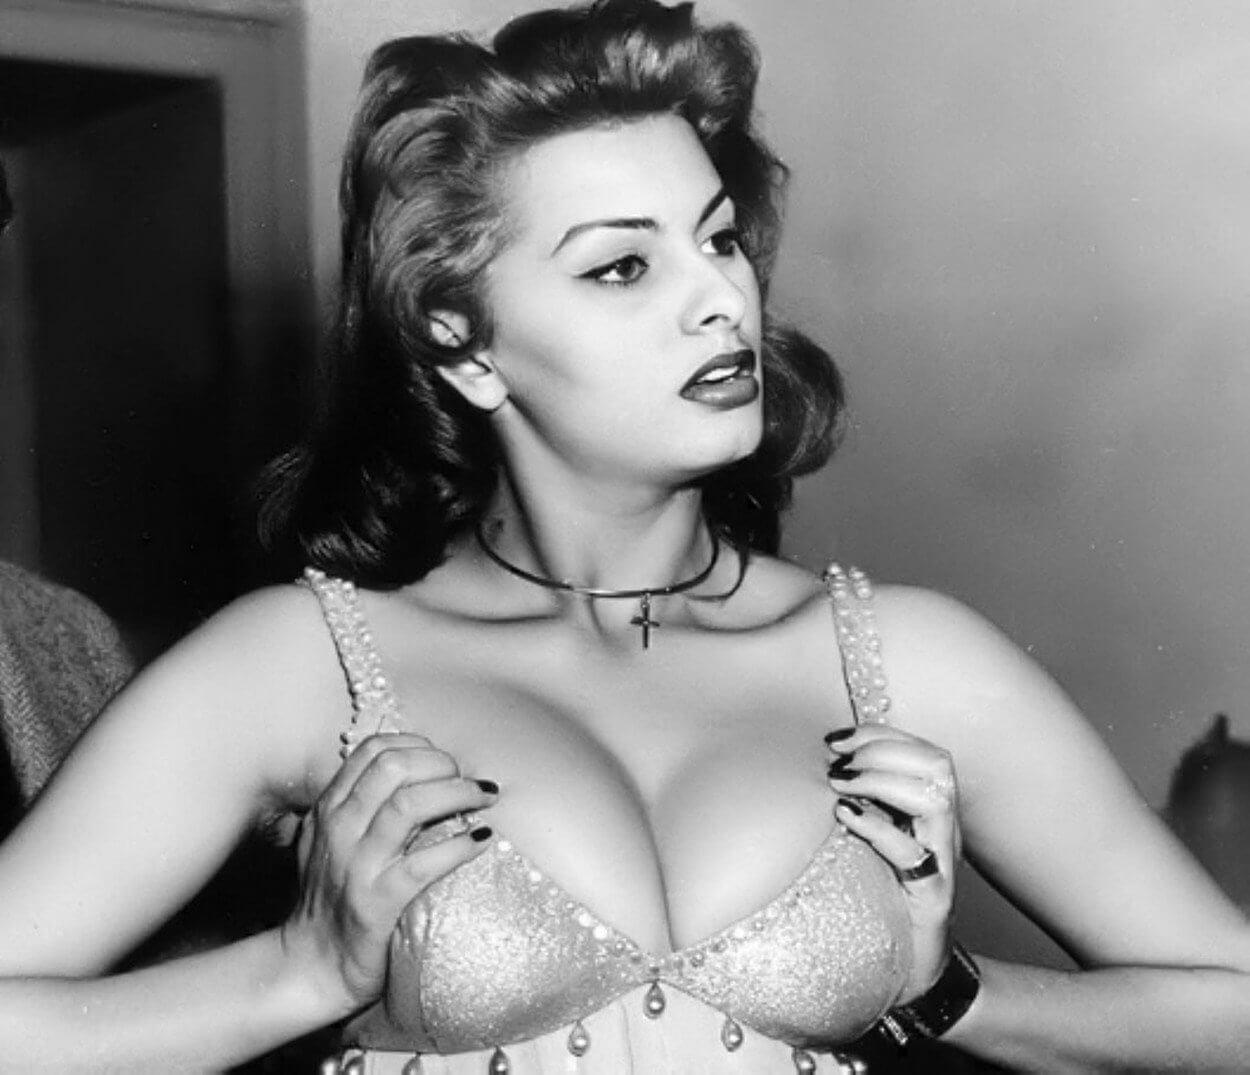 Sophia Loren tits pics